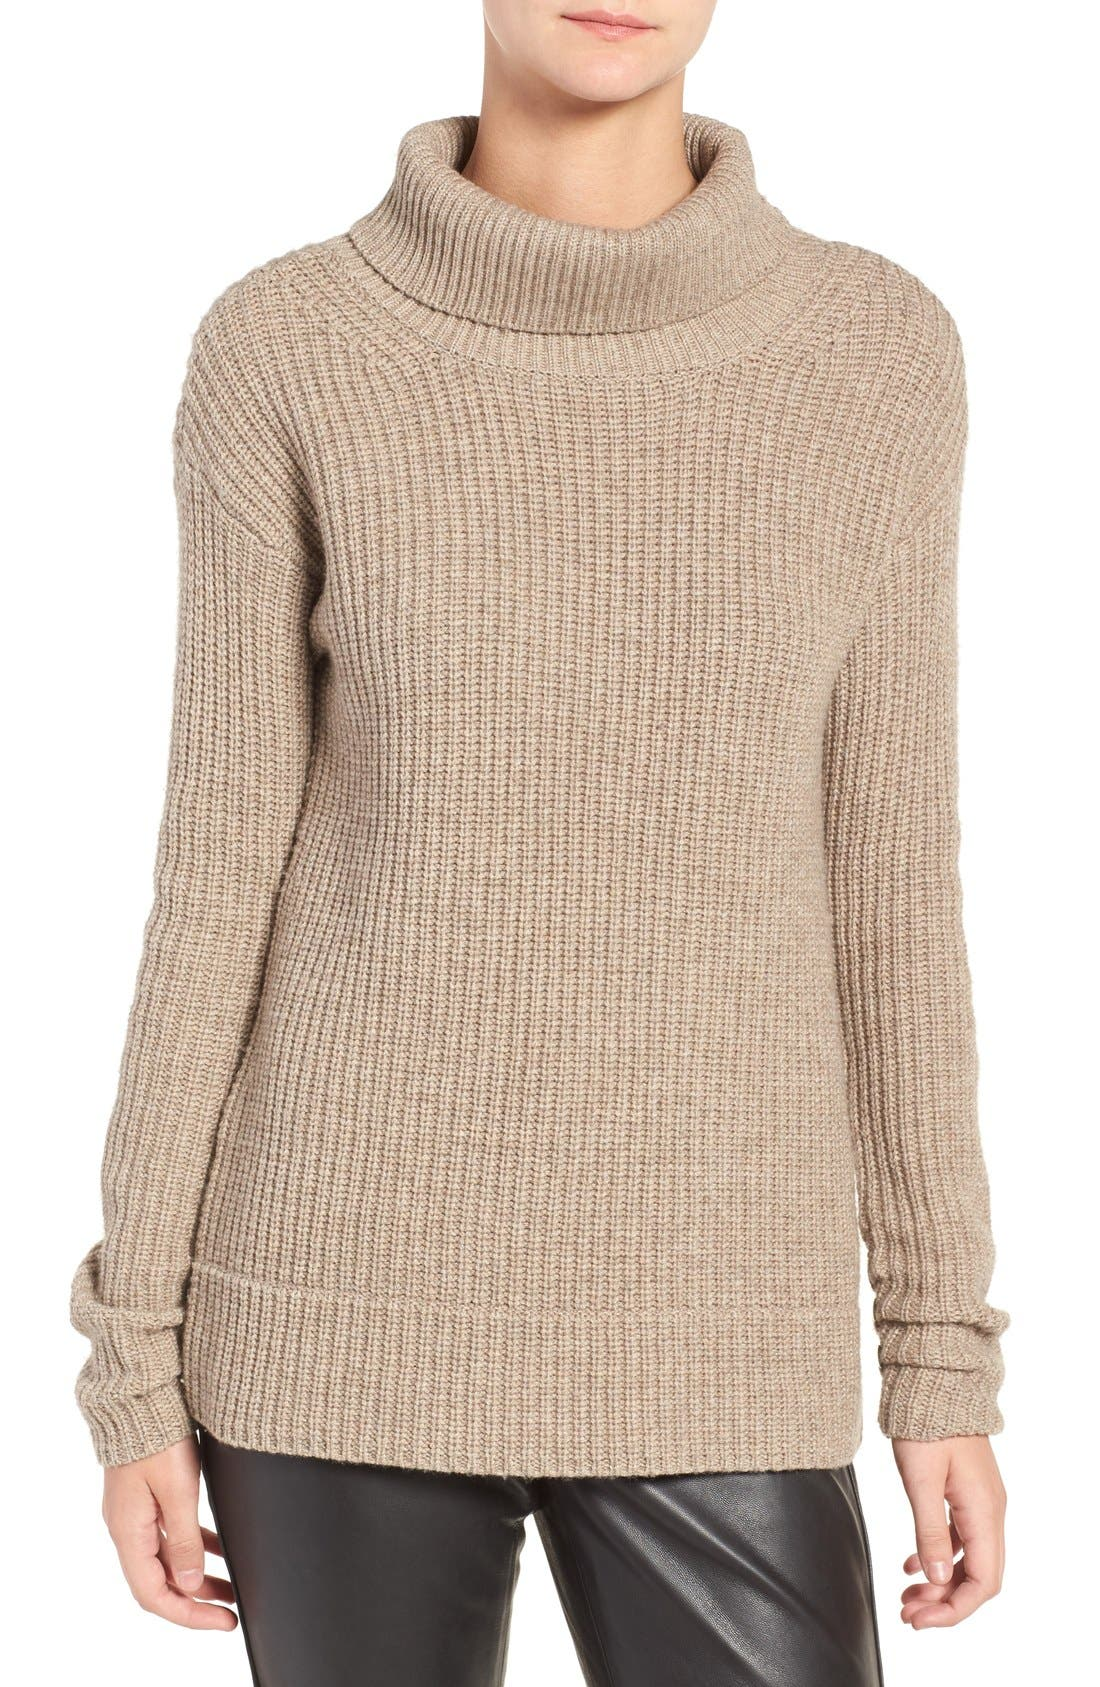 Alternate Image 3  - Olivia Palermo + Chelsea28 Open Back Wool & Cashmere Turtleneck Sweater